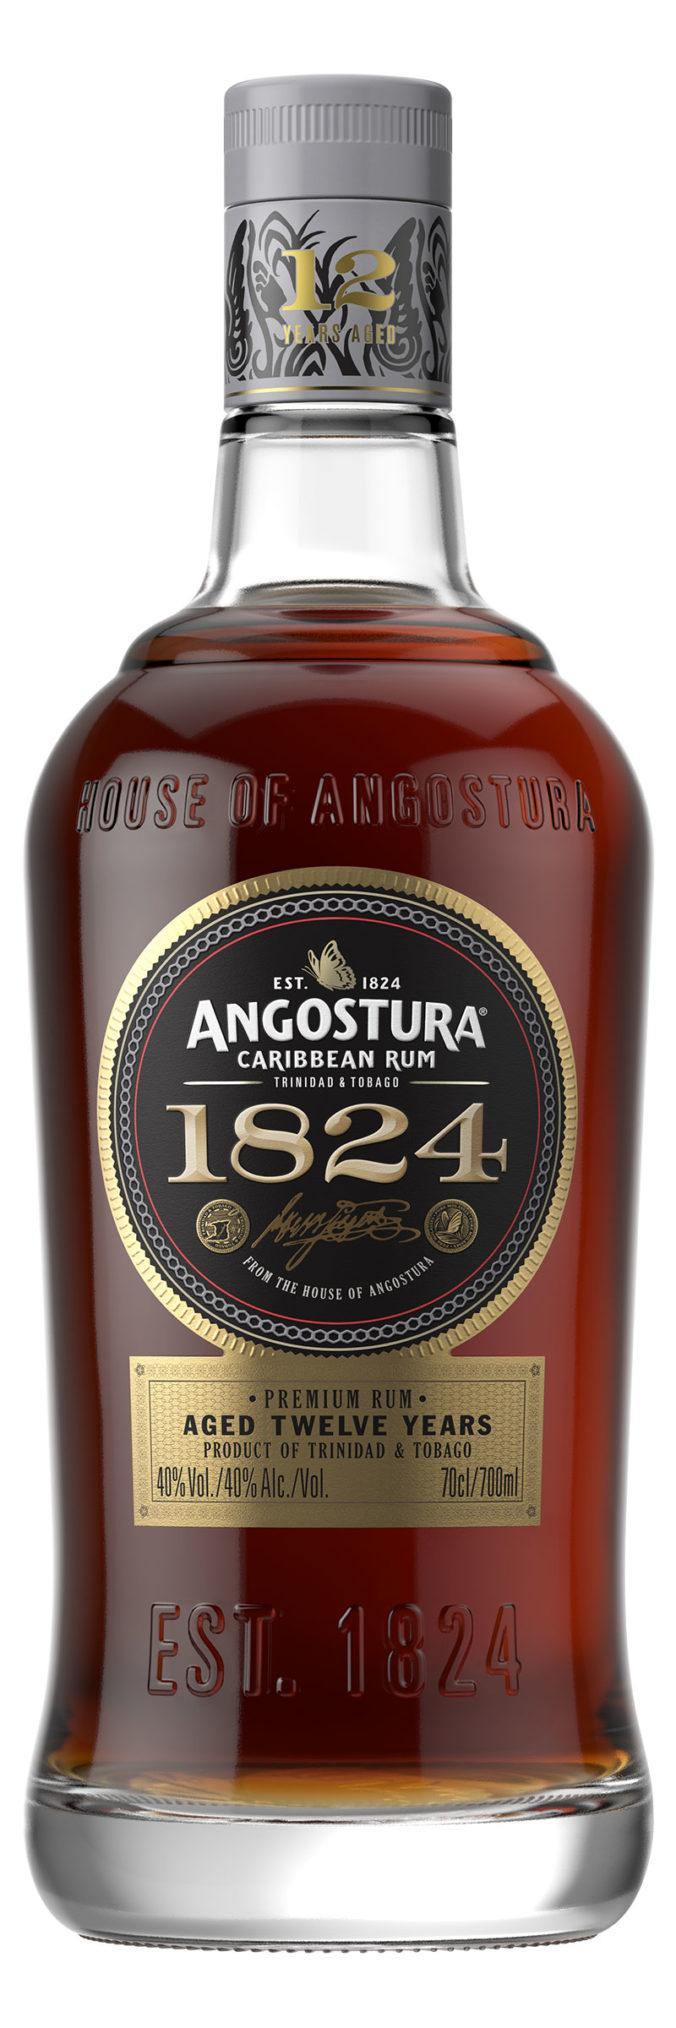 Angostura 1824 aged rum from Trinidad